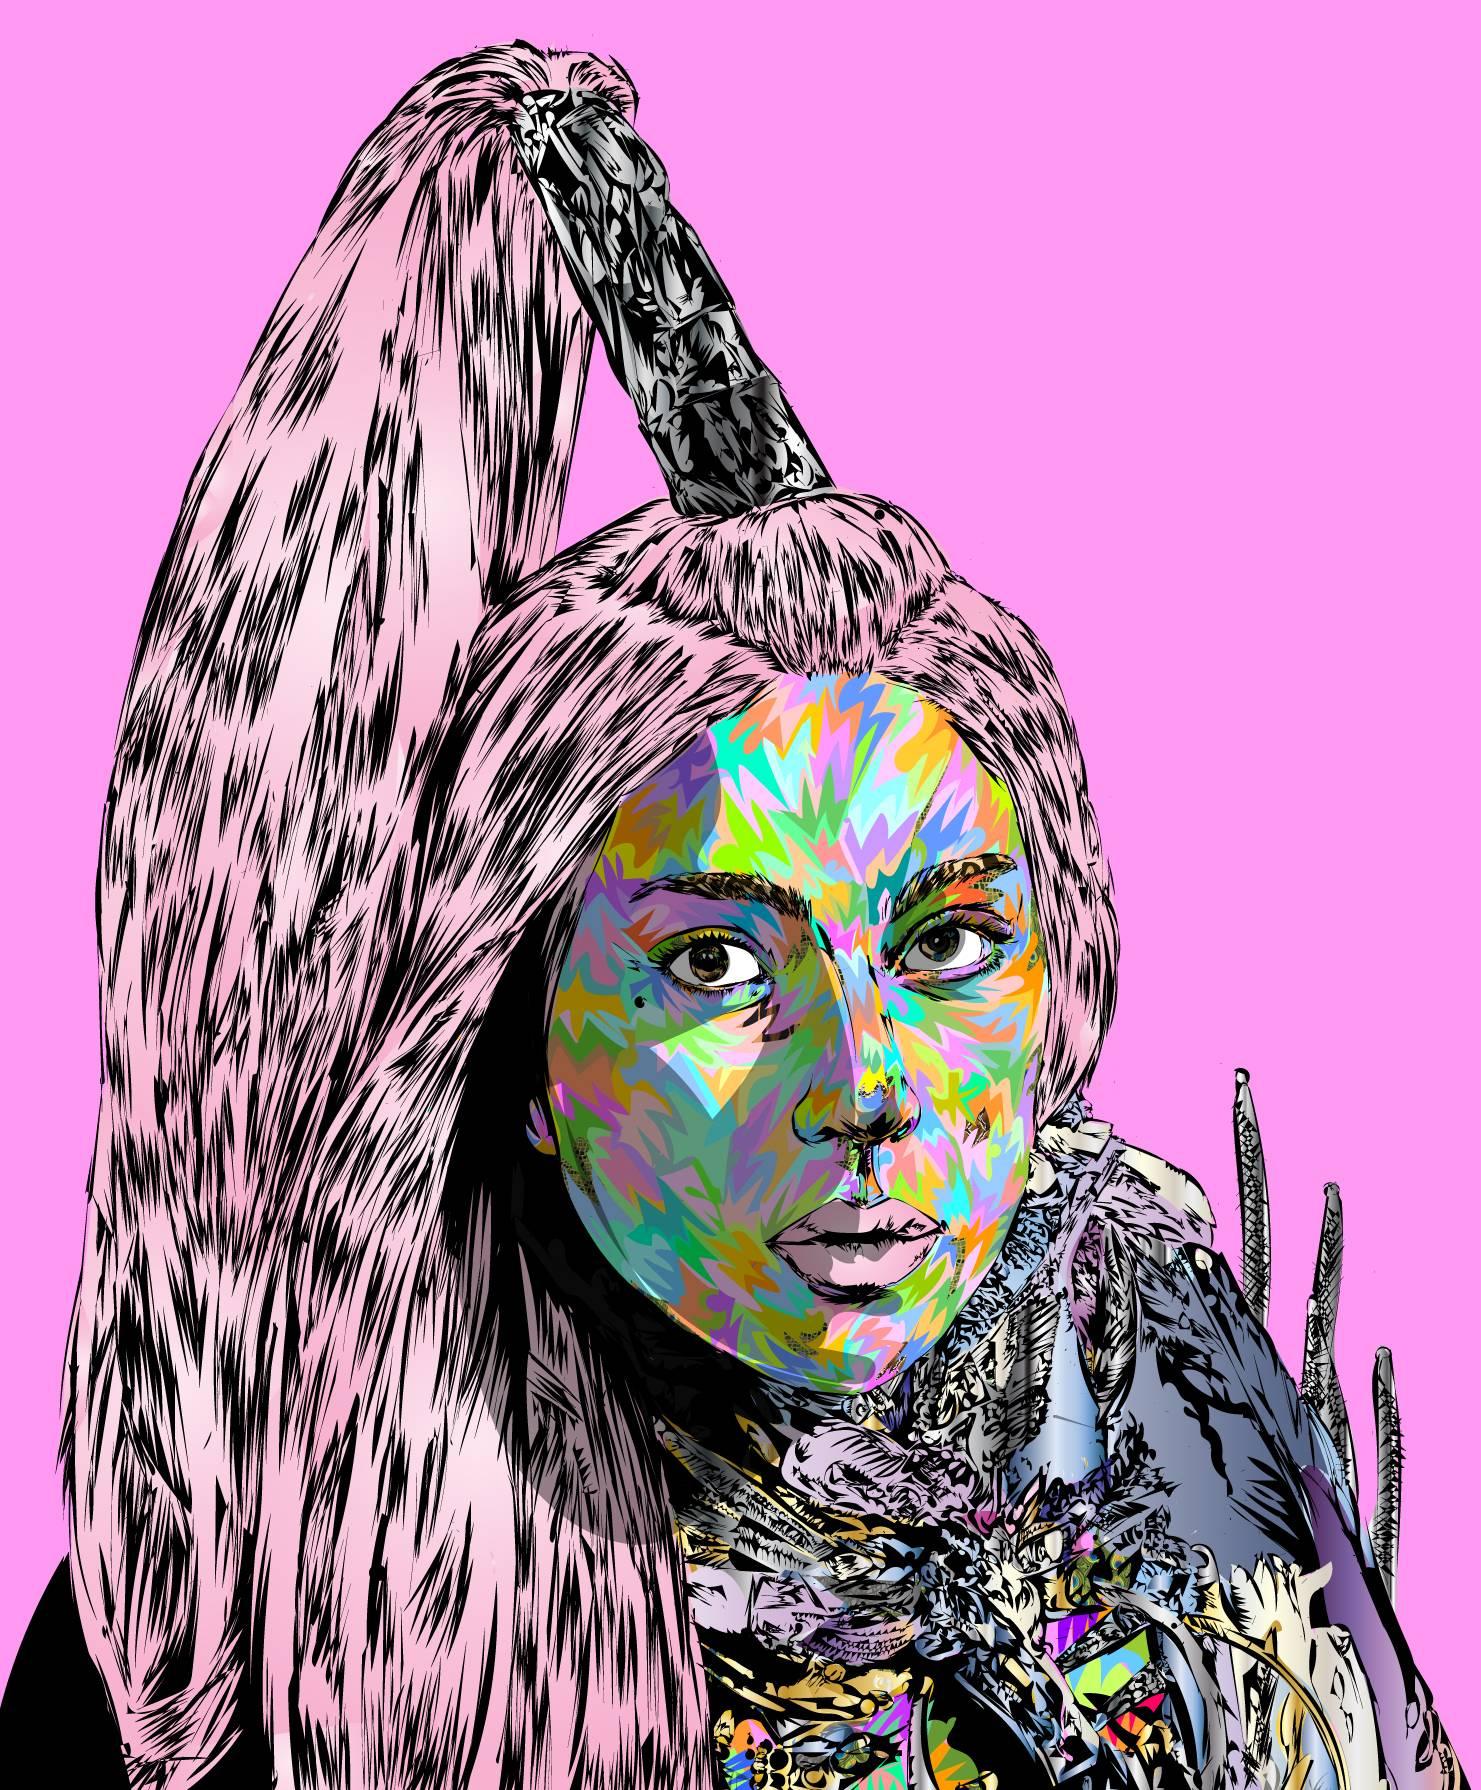 2020 VMA | Artist Spotlight Flipbook Lady Gaga by Joshua Williams